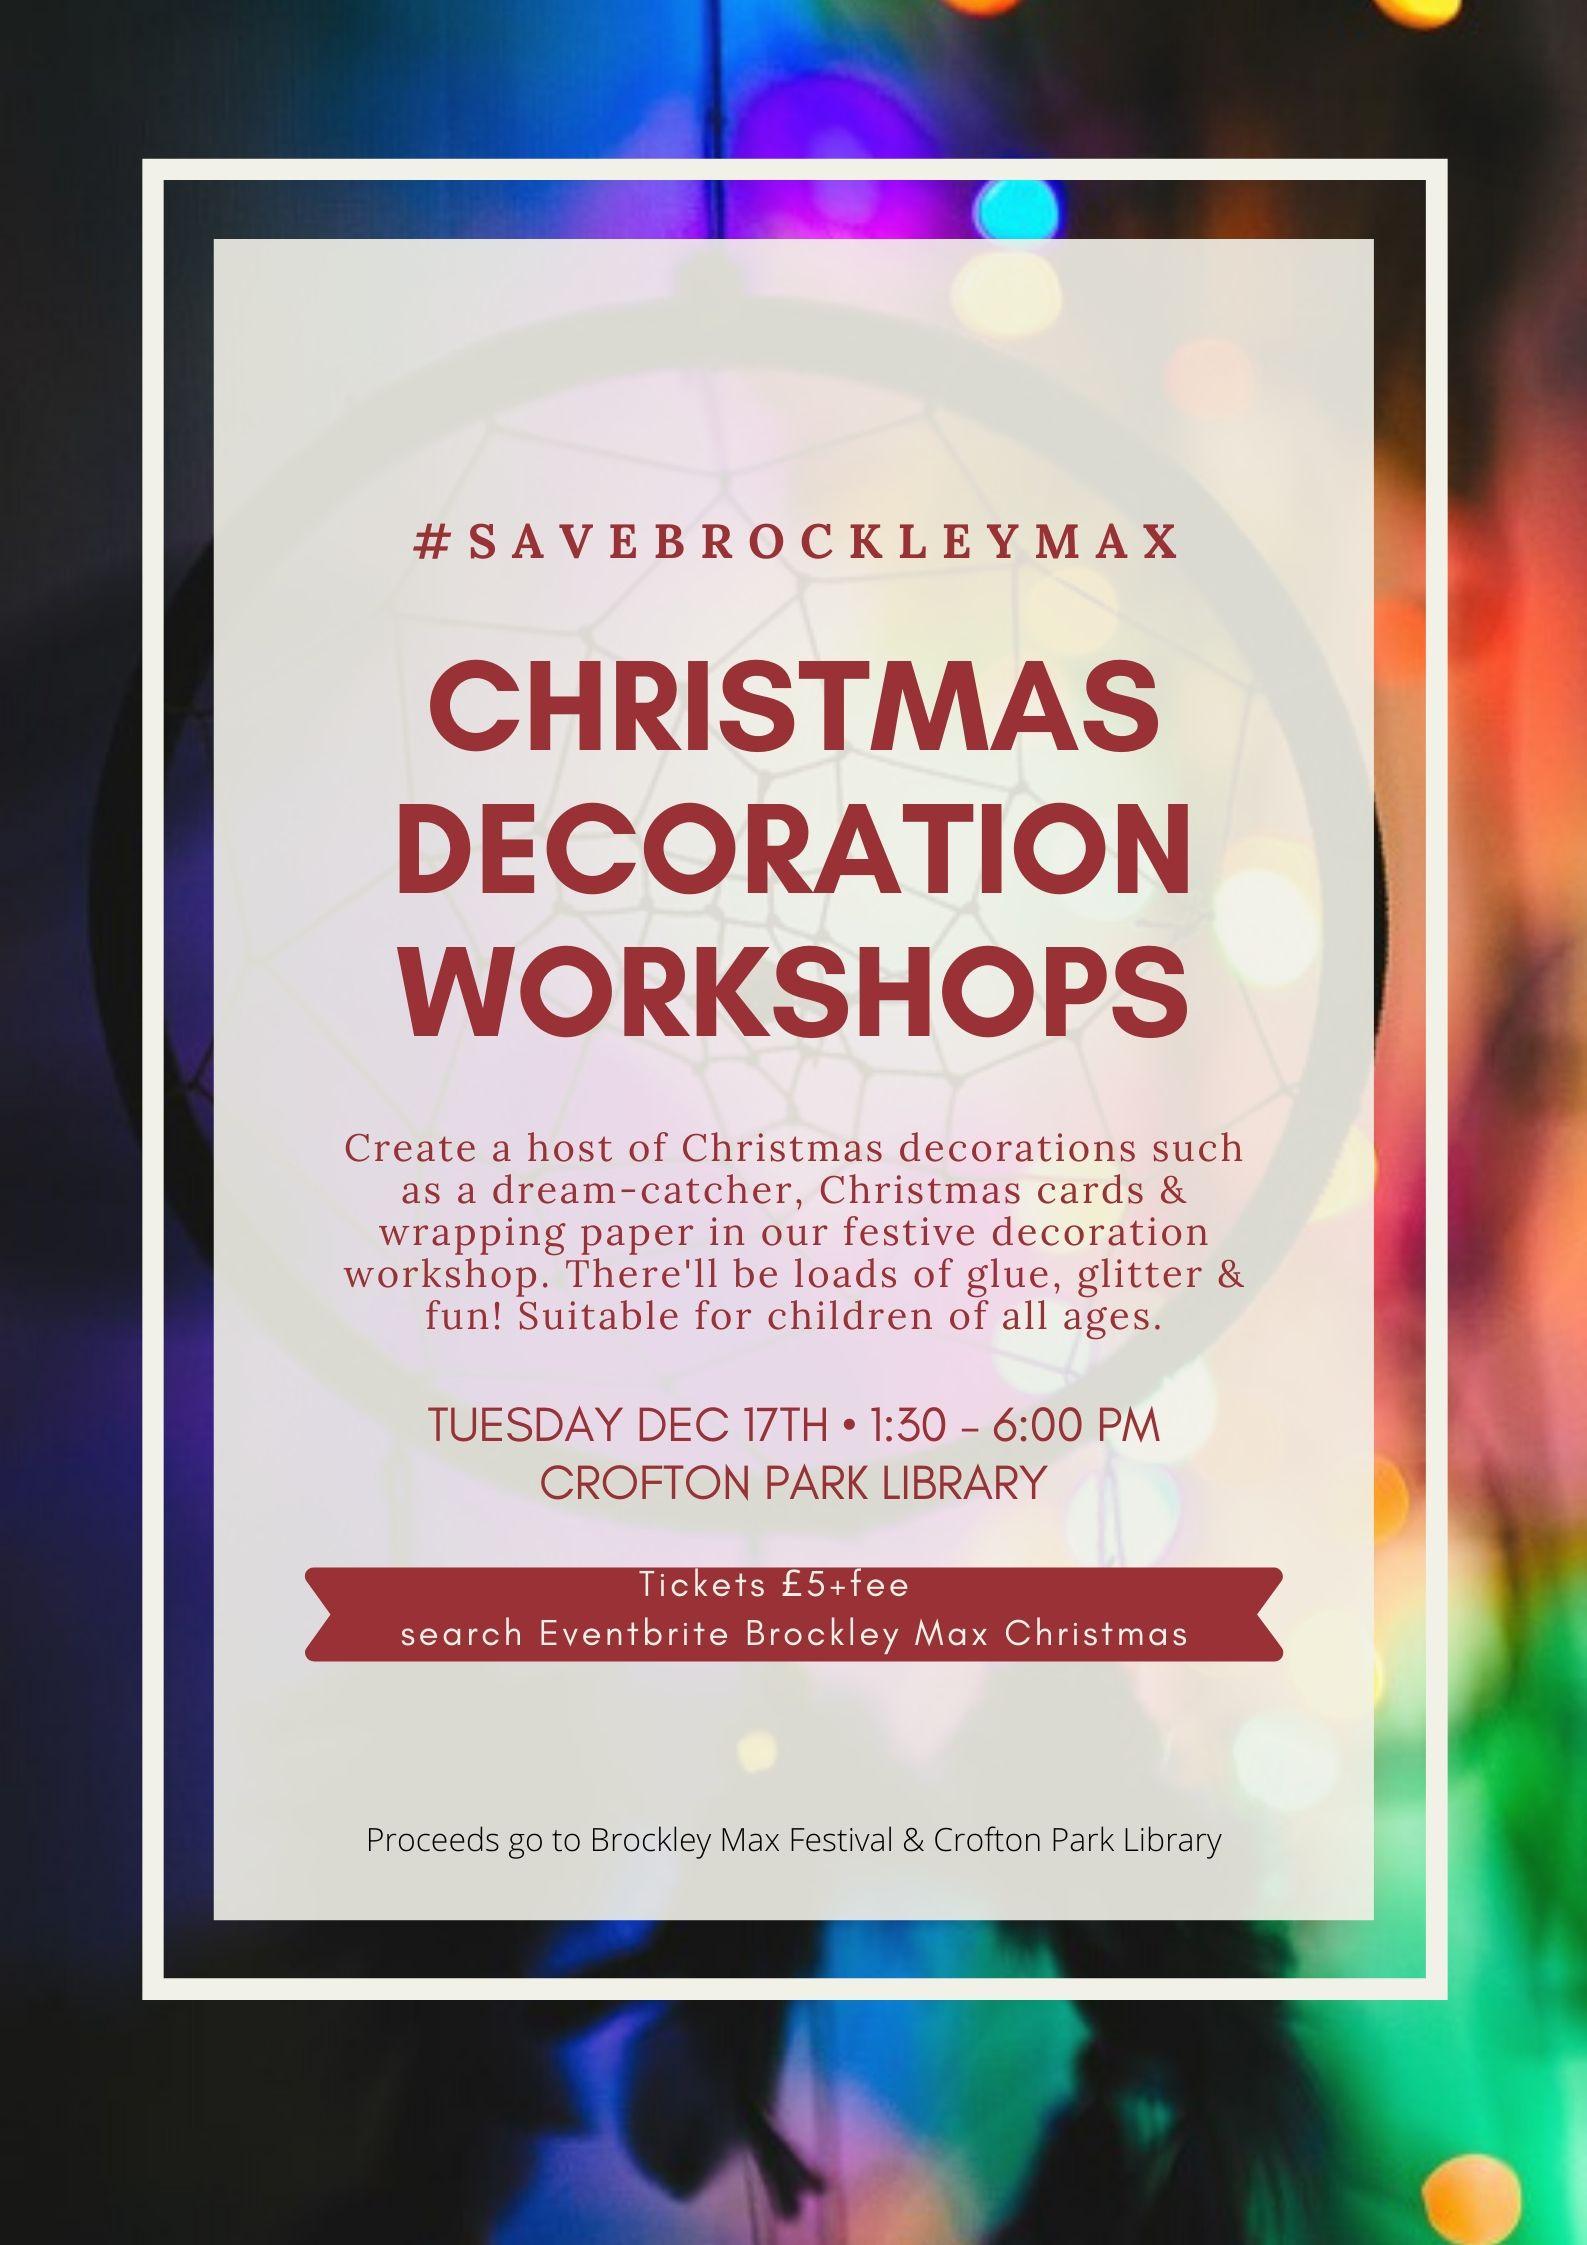 Brockley Max Xmas decoration workshop poster